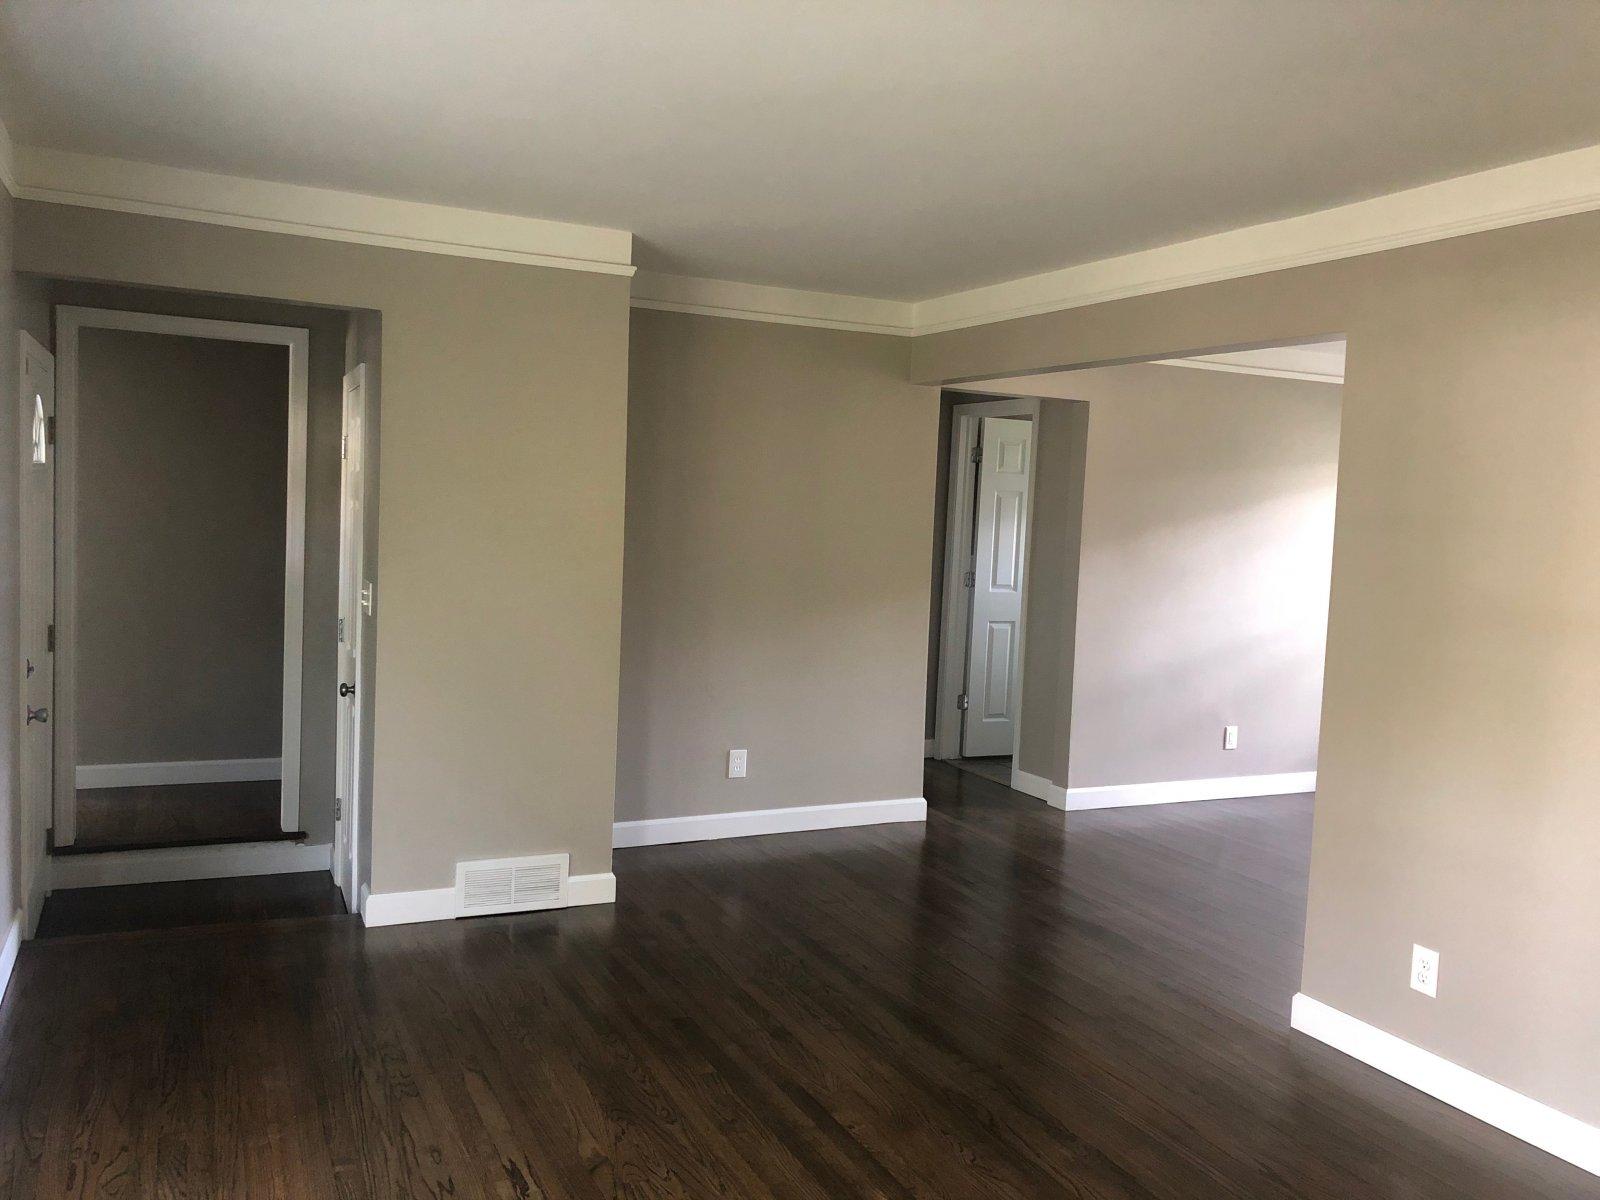 House for sale in southfield mi